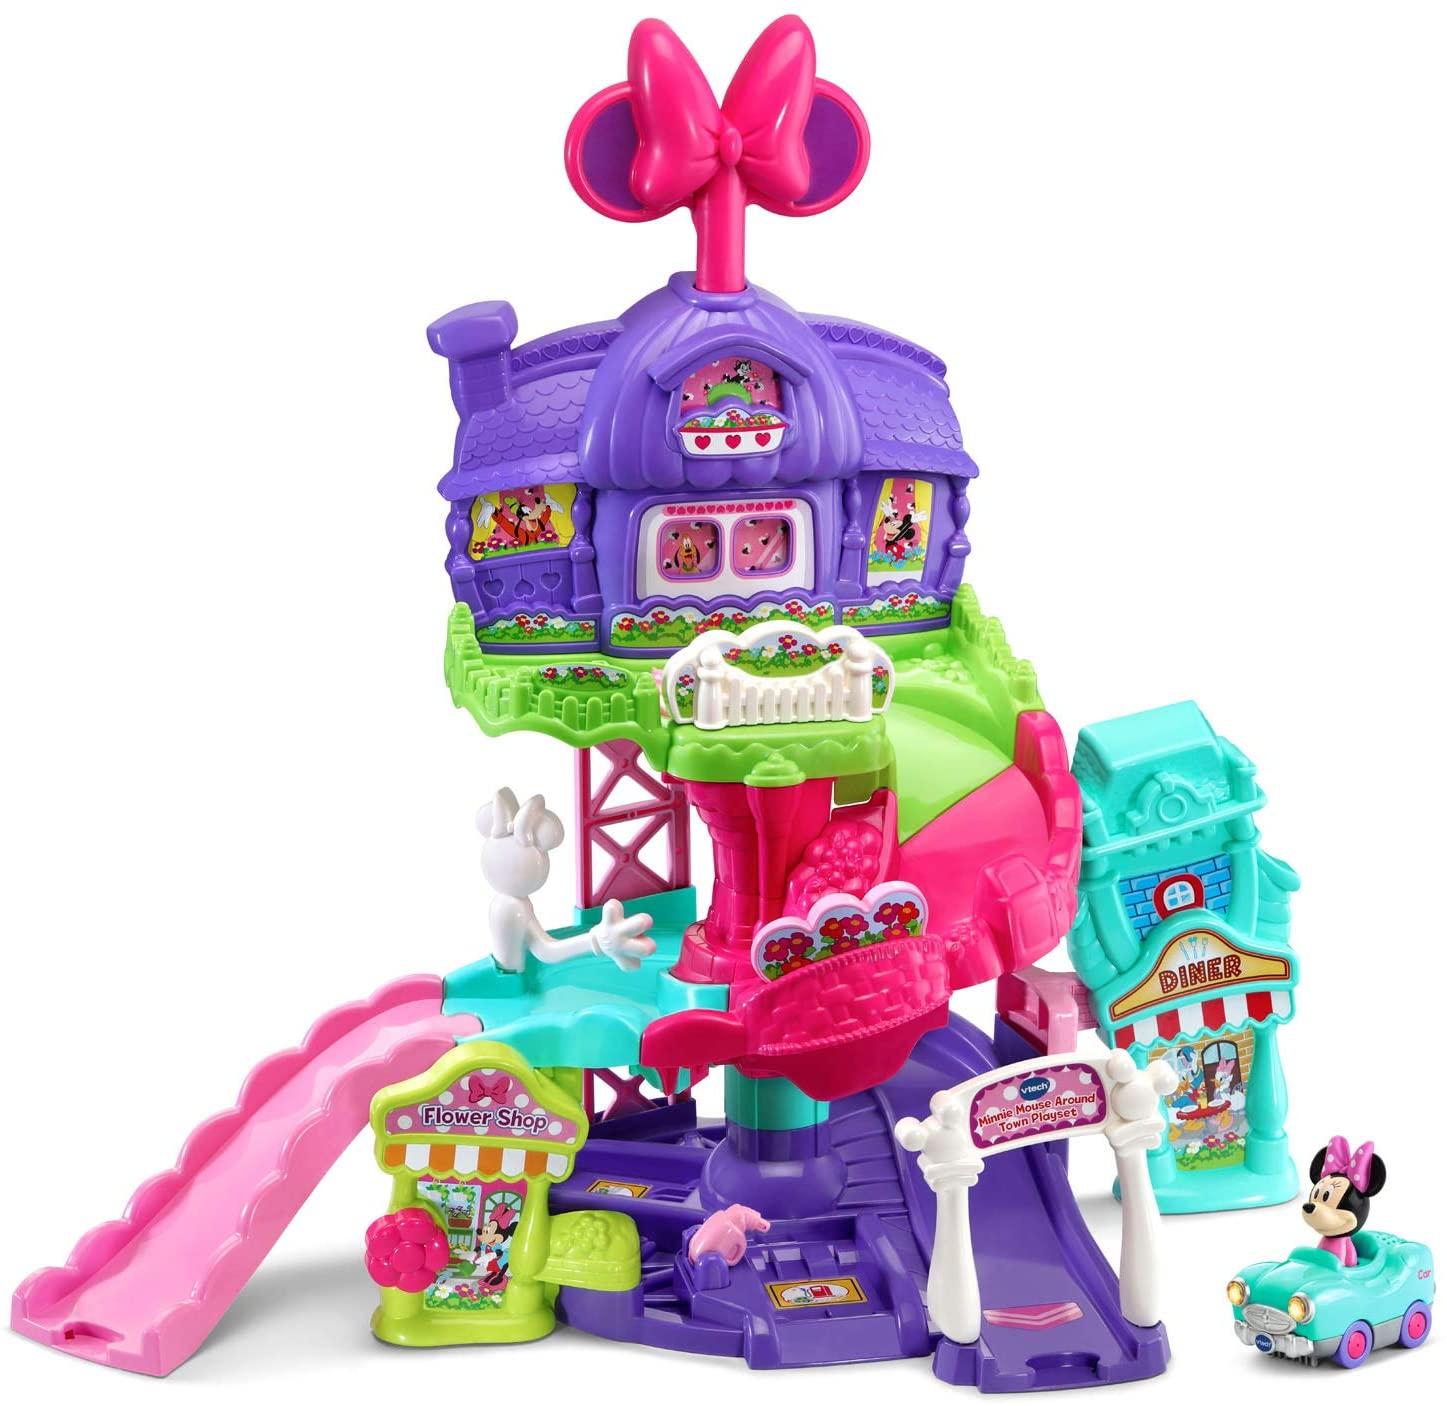 VTech Go! Go! Smart Wheels Disney Minnie Mouse Around Town Playset $17.50 + Free Shipping w/ Amazon Prime or Orders $25+